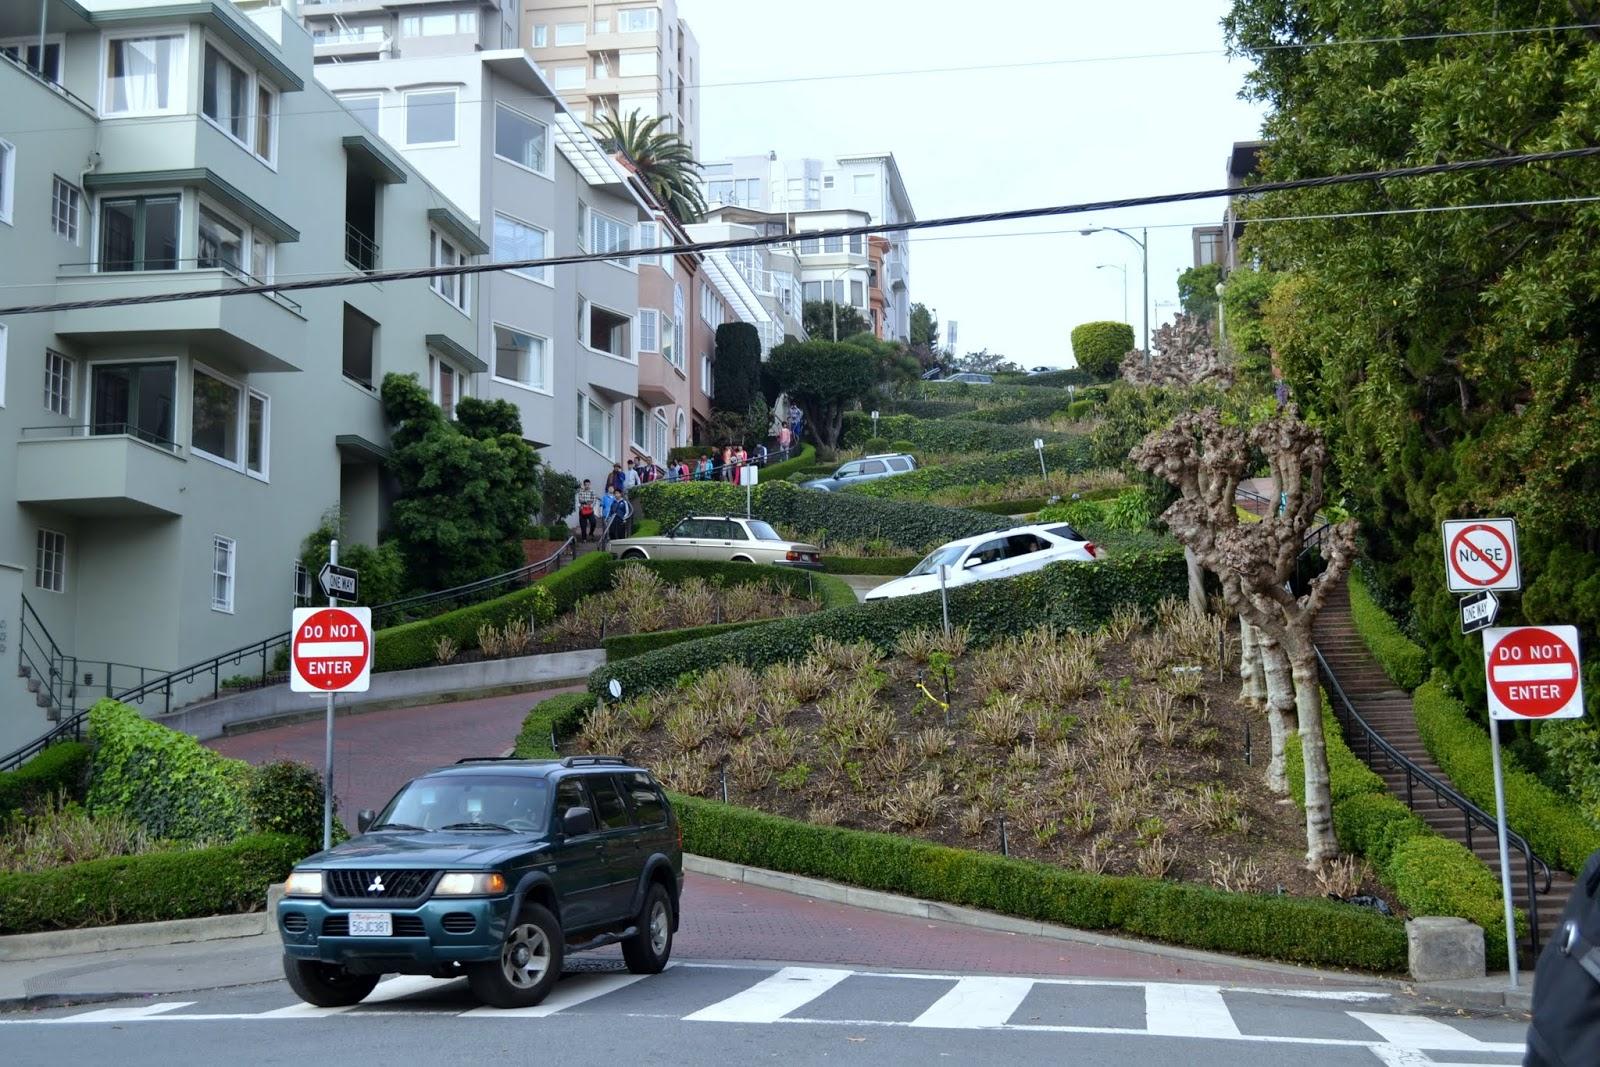 Сан-Франциско, улица Ломбард. (San Francisco, Lombard Street)